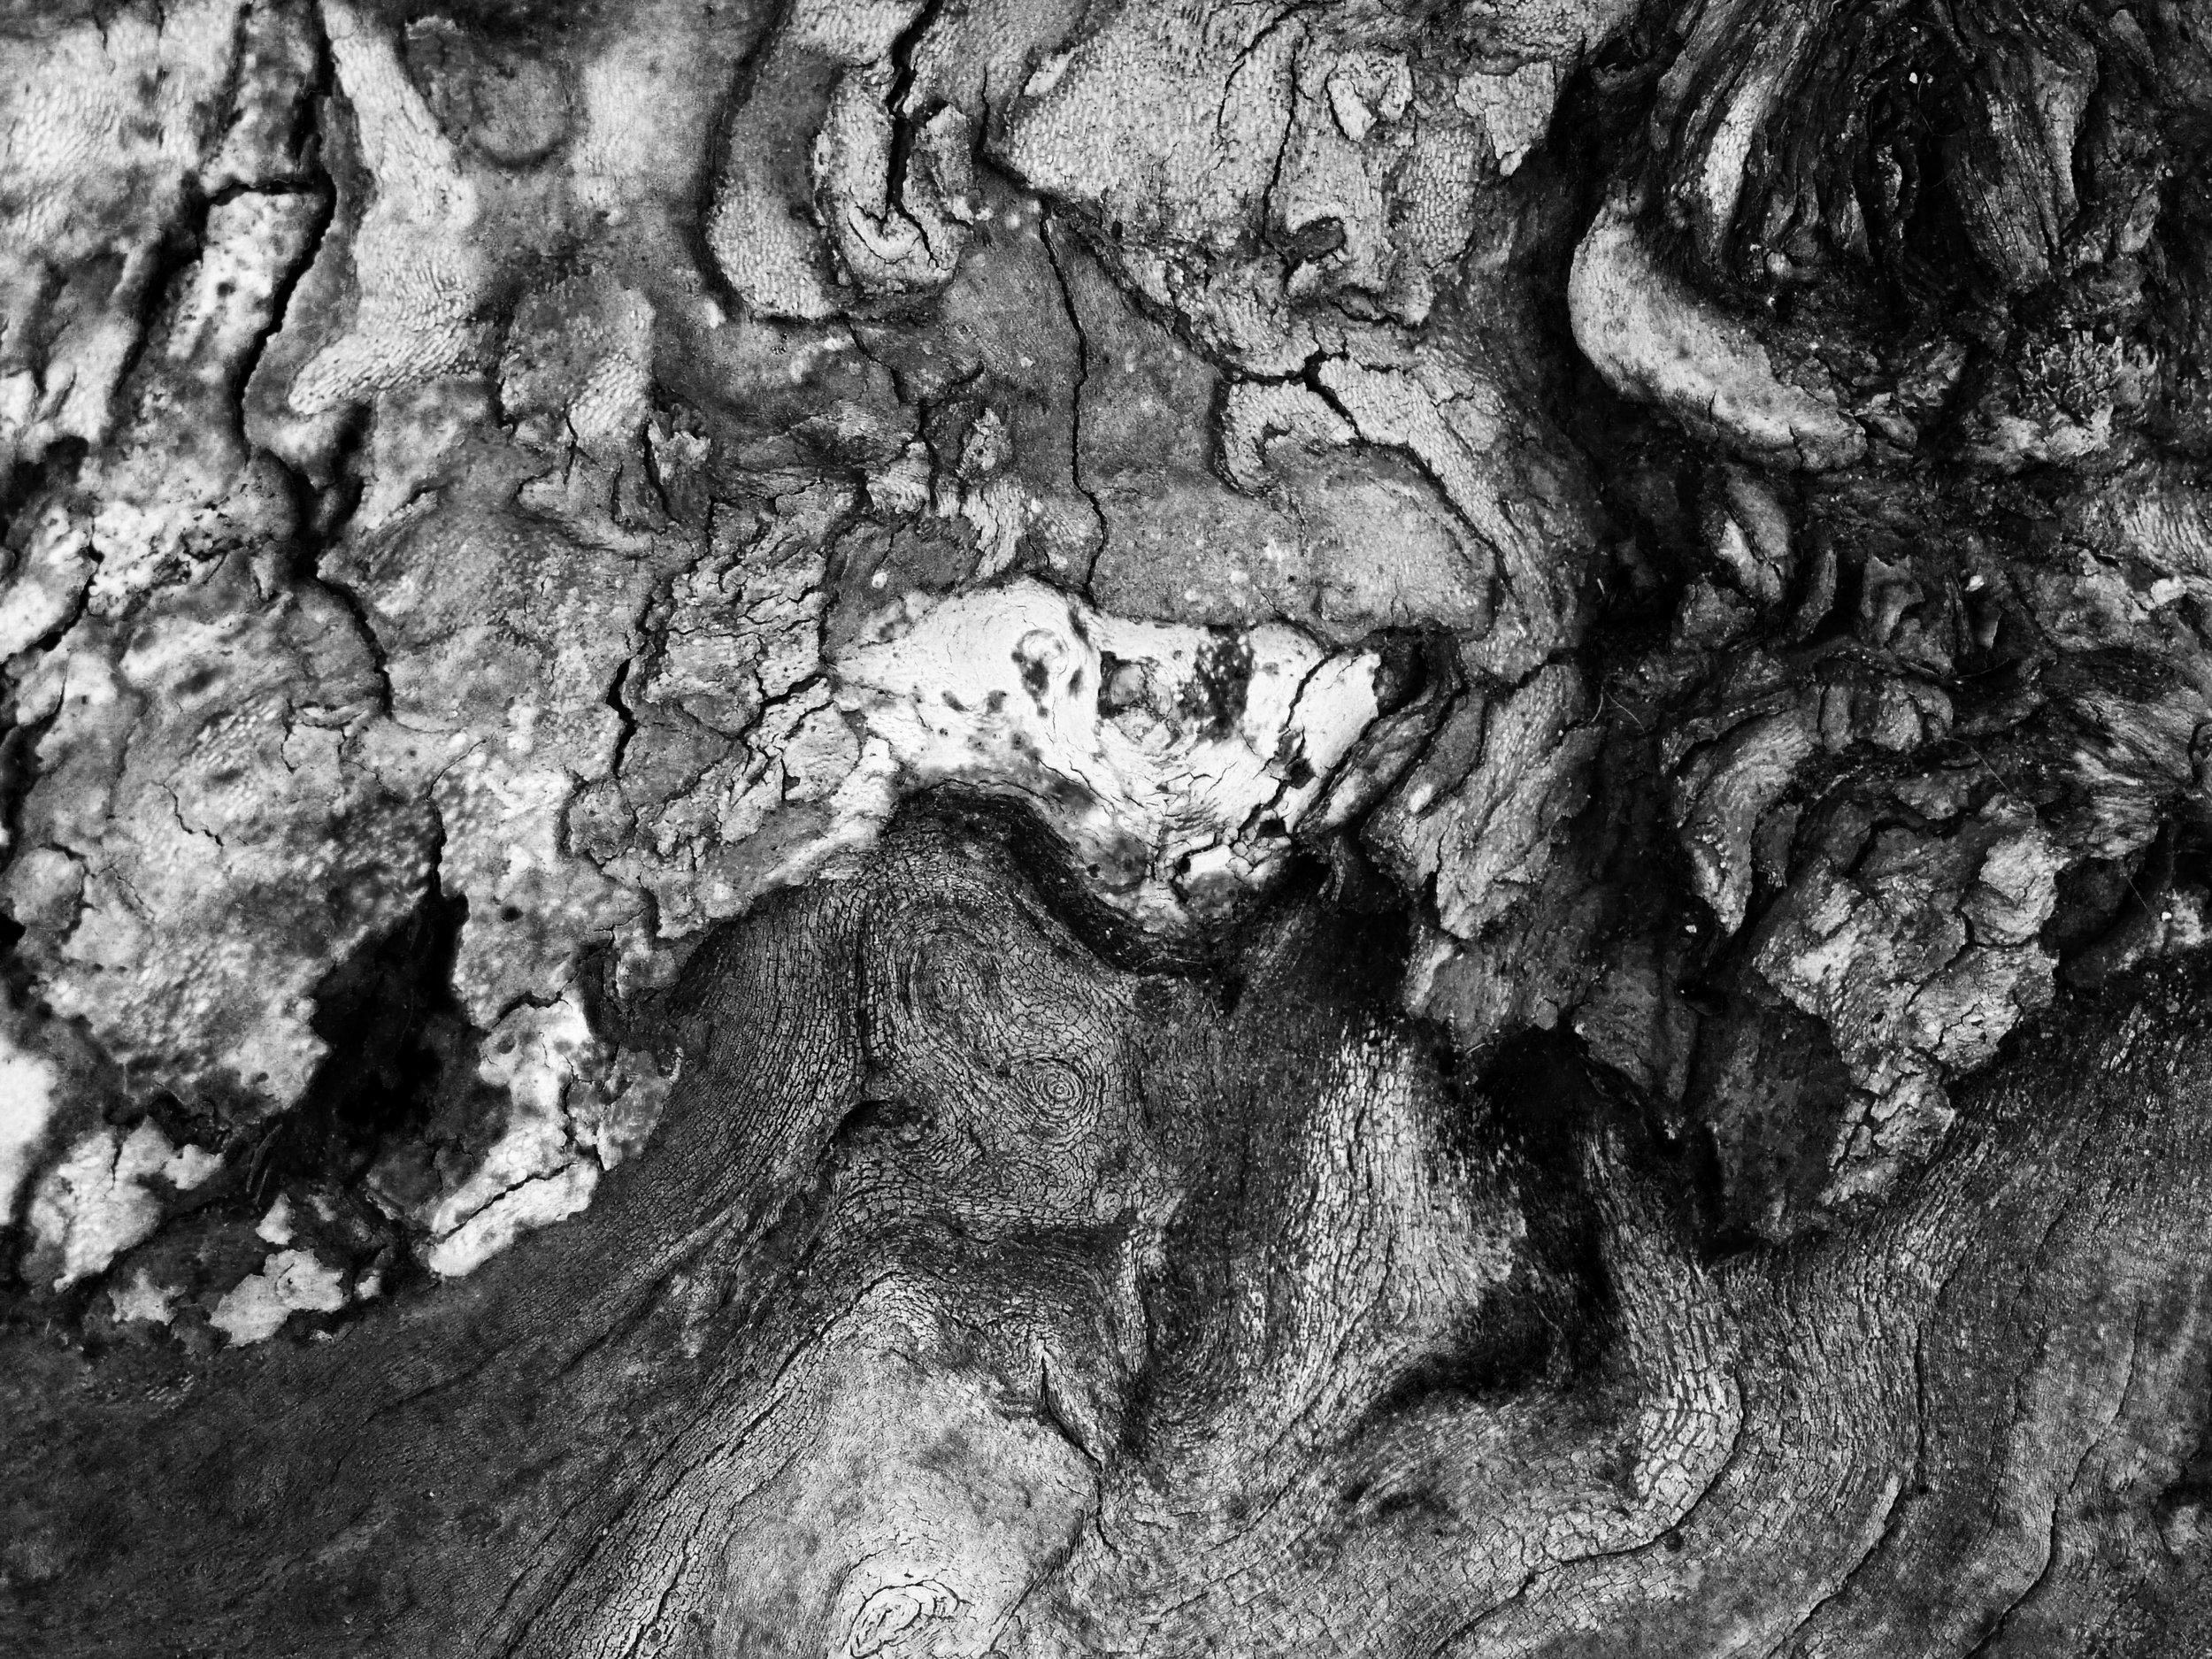 abstract_tree_photography.jpg